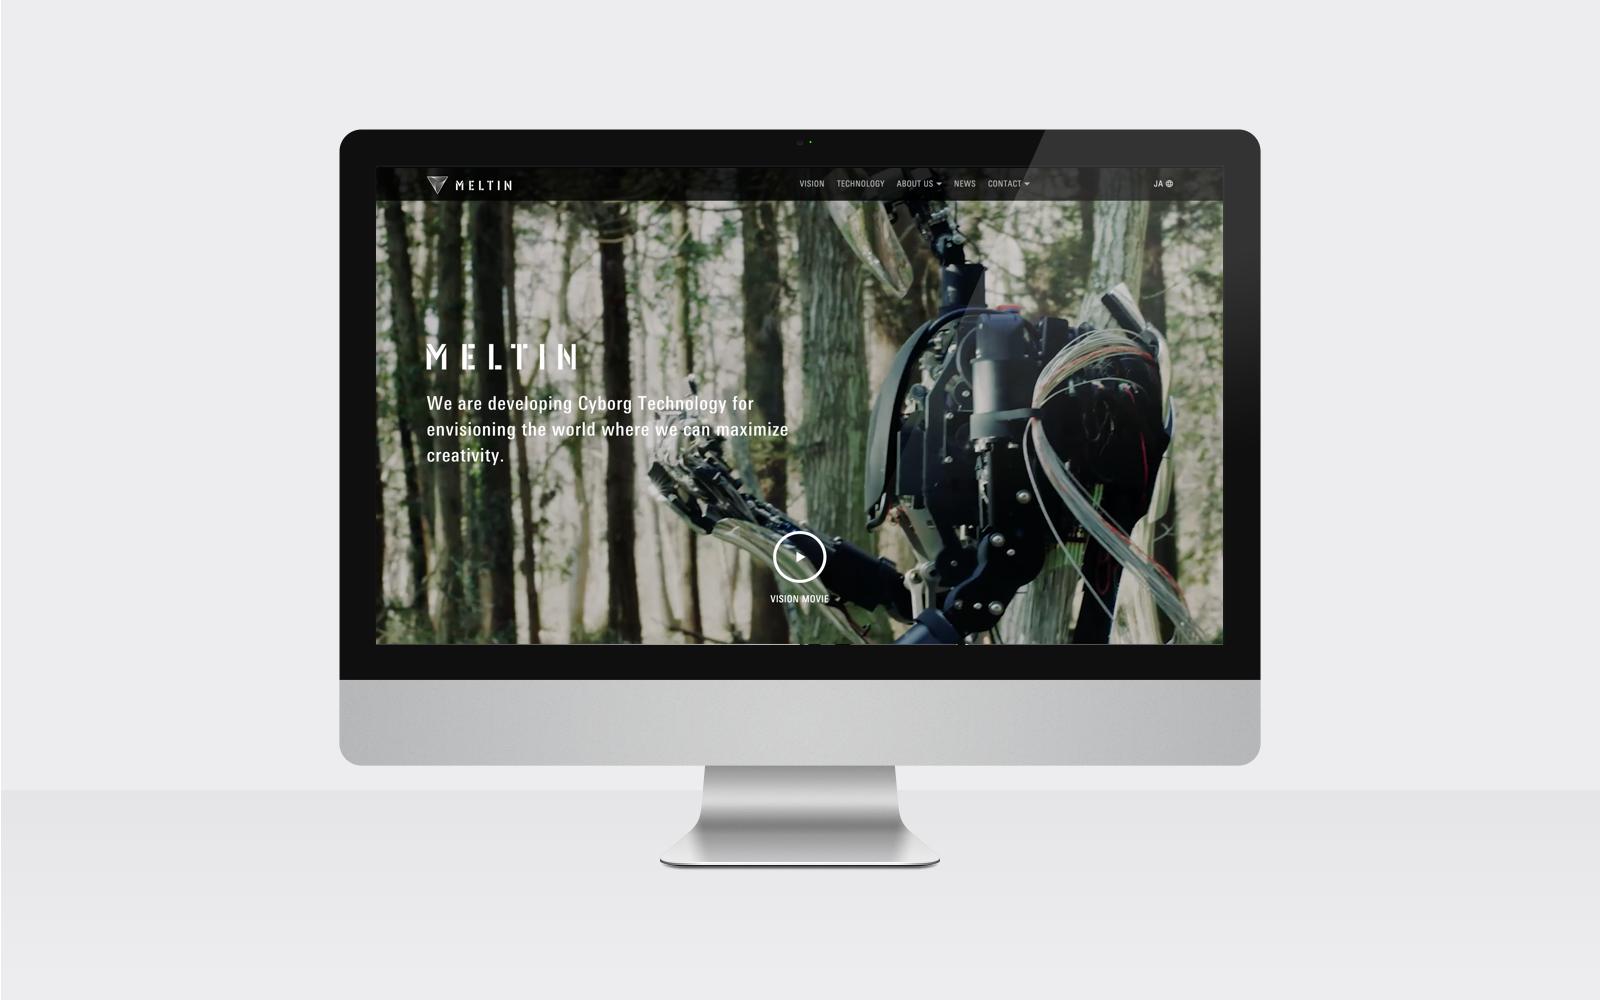 「MELTIN MMI」コーポレートサイト